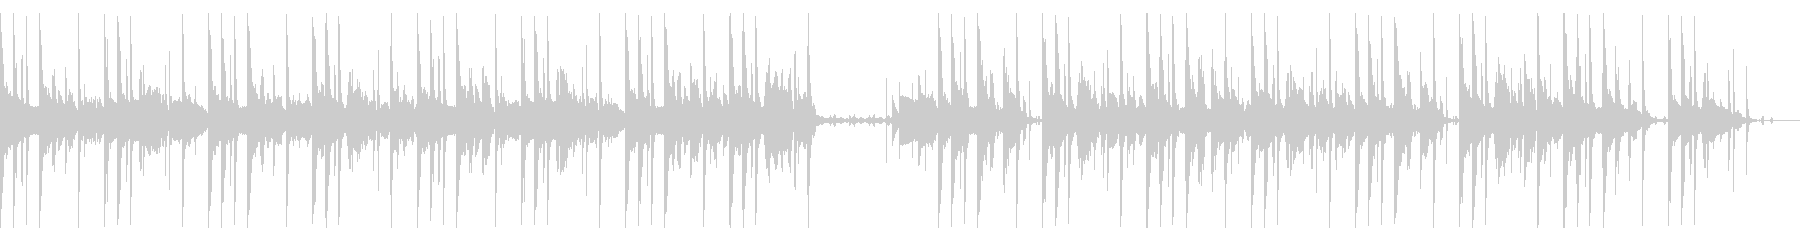 90 BPMの未再生の波形